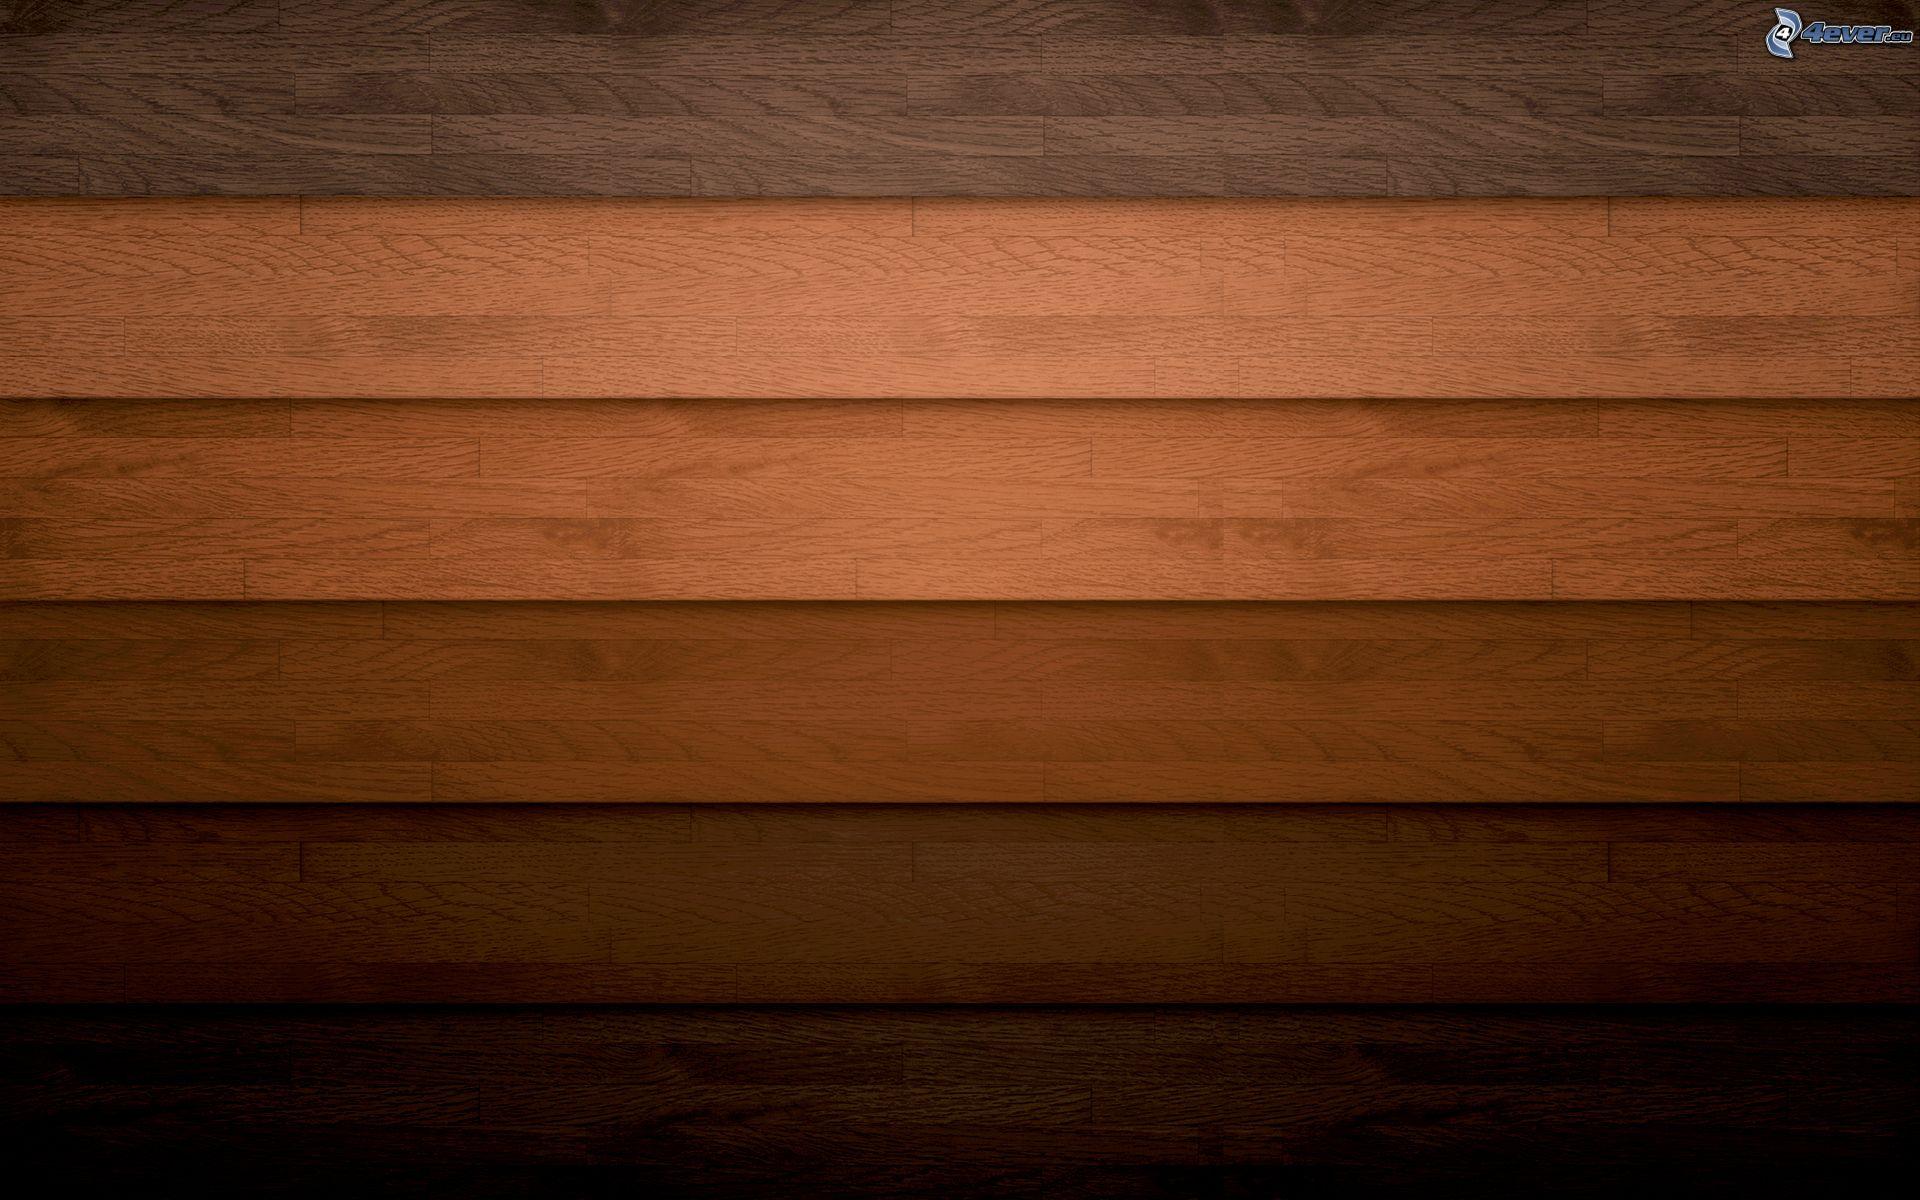 Holz - Wallpaper holz ...